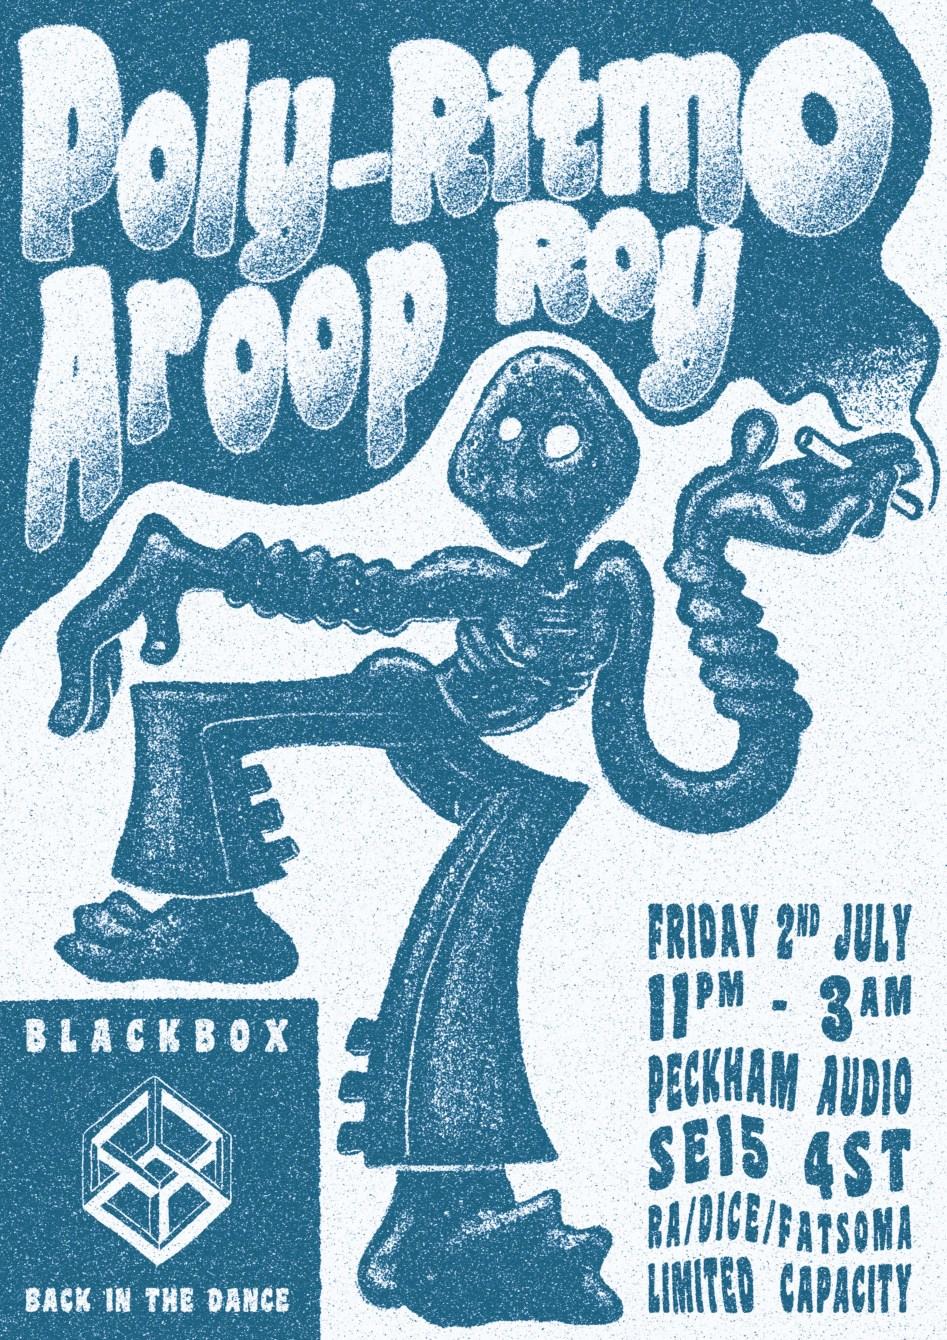 Blackbox Back in the Dance: Poly-Ritmo & Aroop Roy - Flyer back